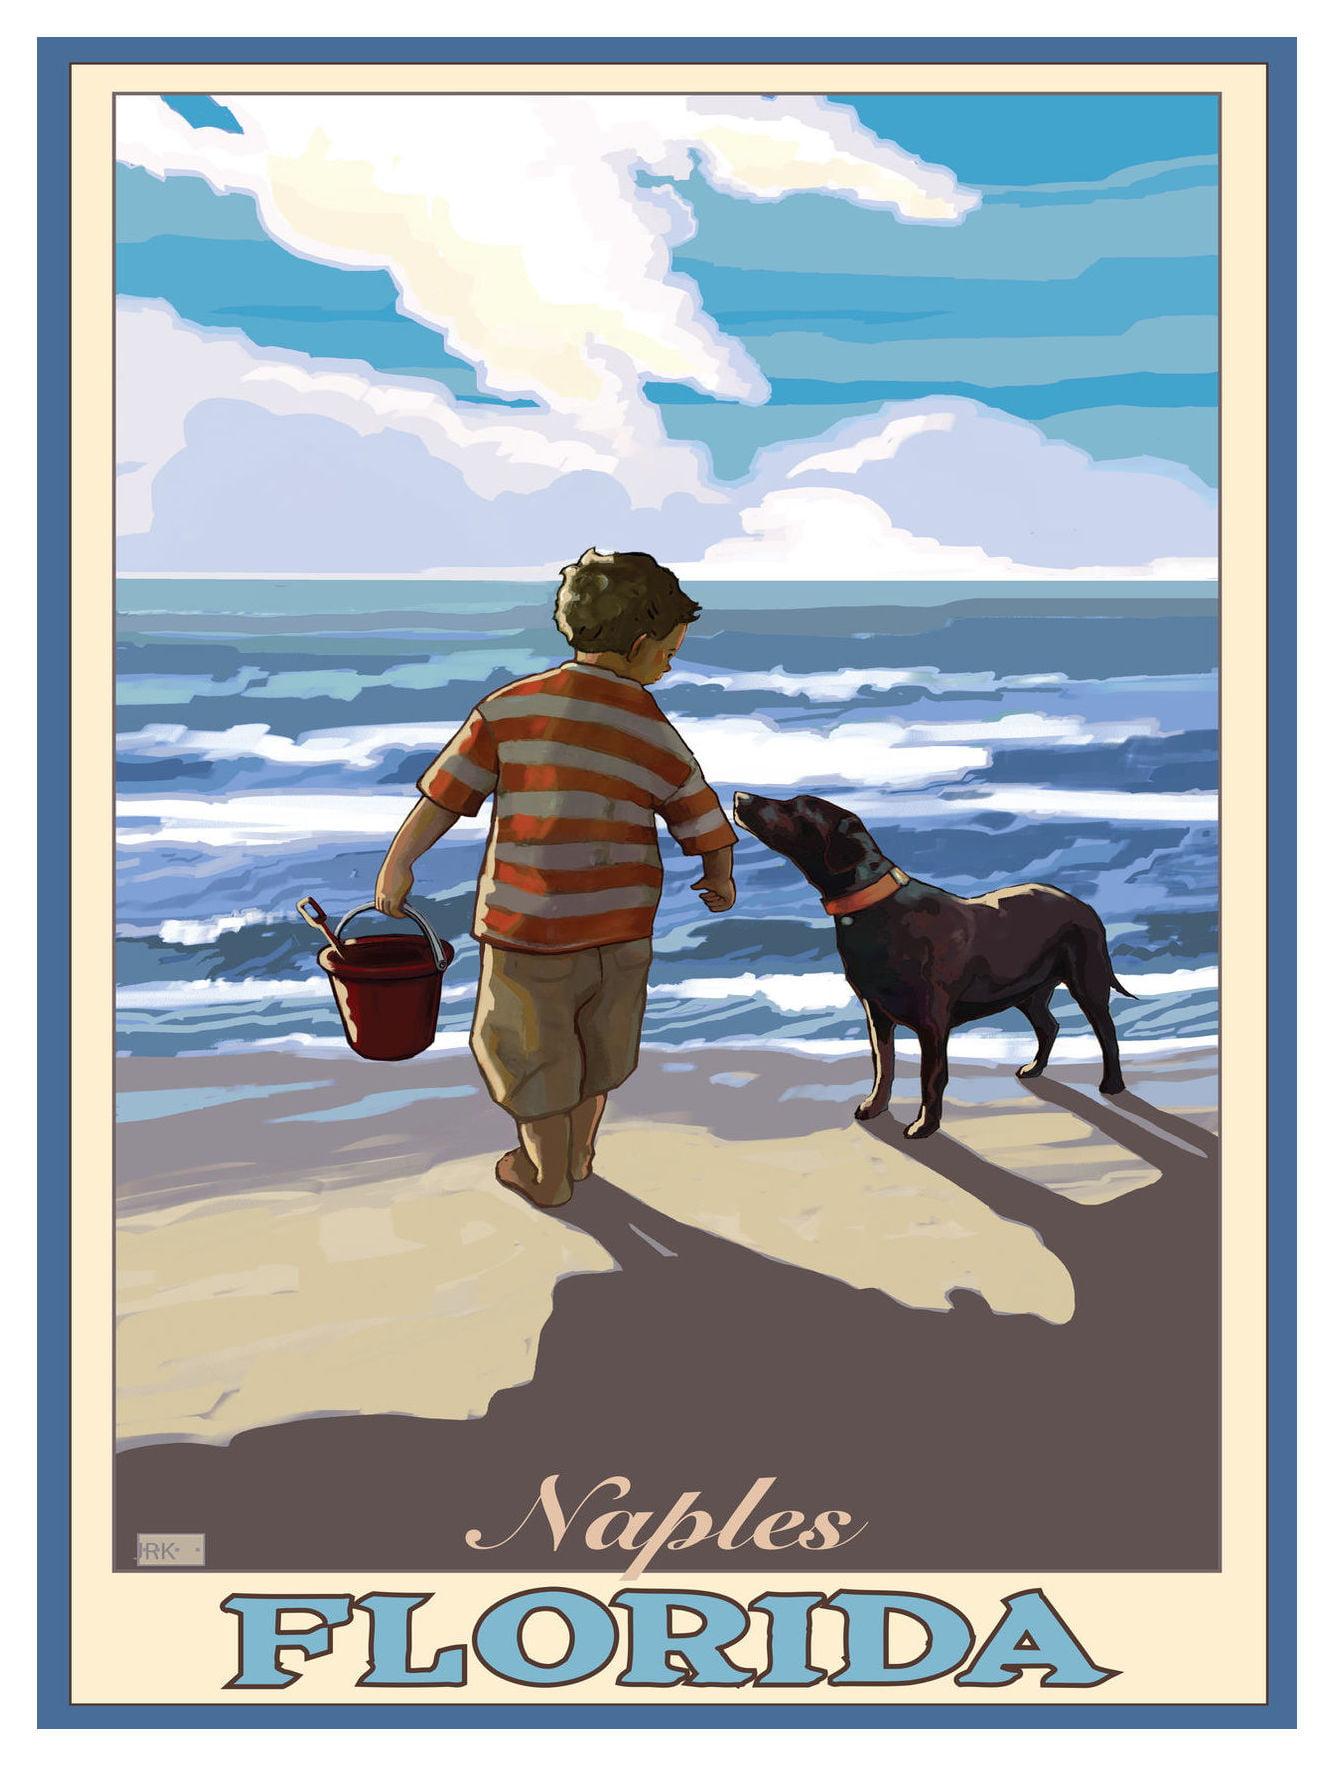 Naples Florida Boy Dog East Giclee Art Print Poster by ...